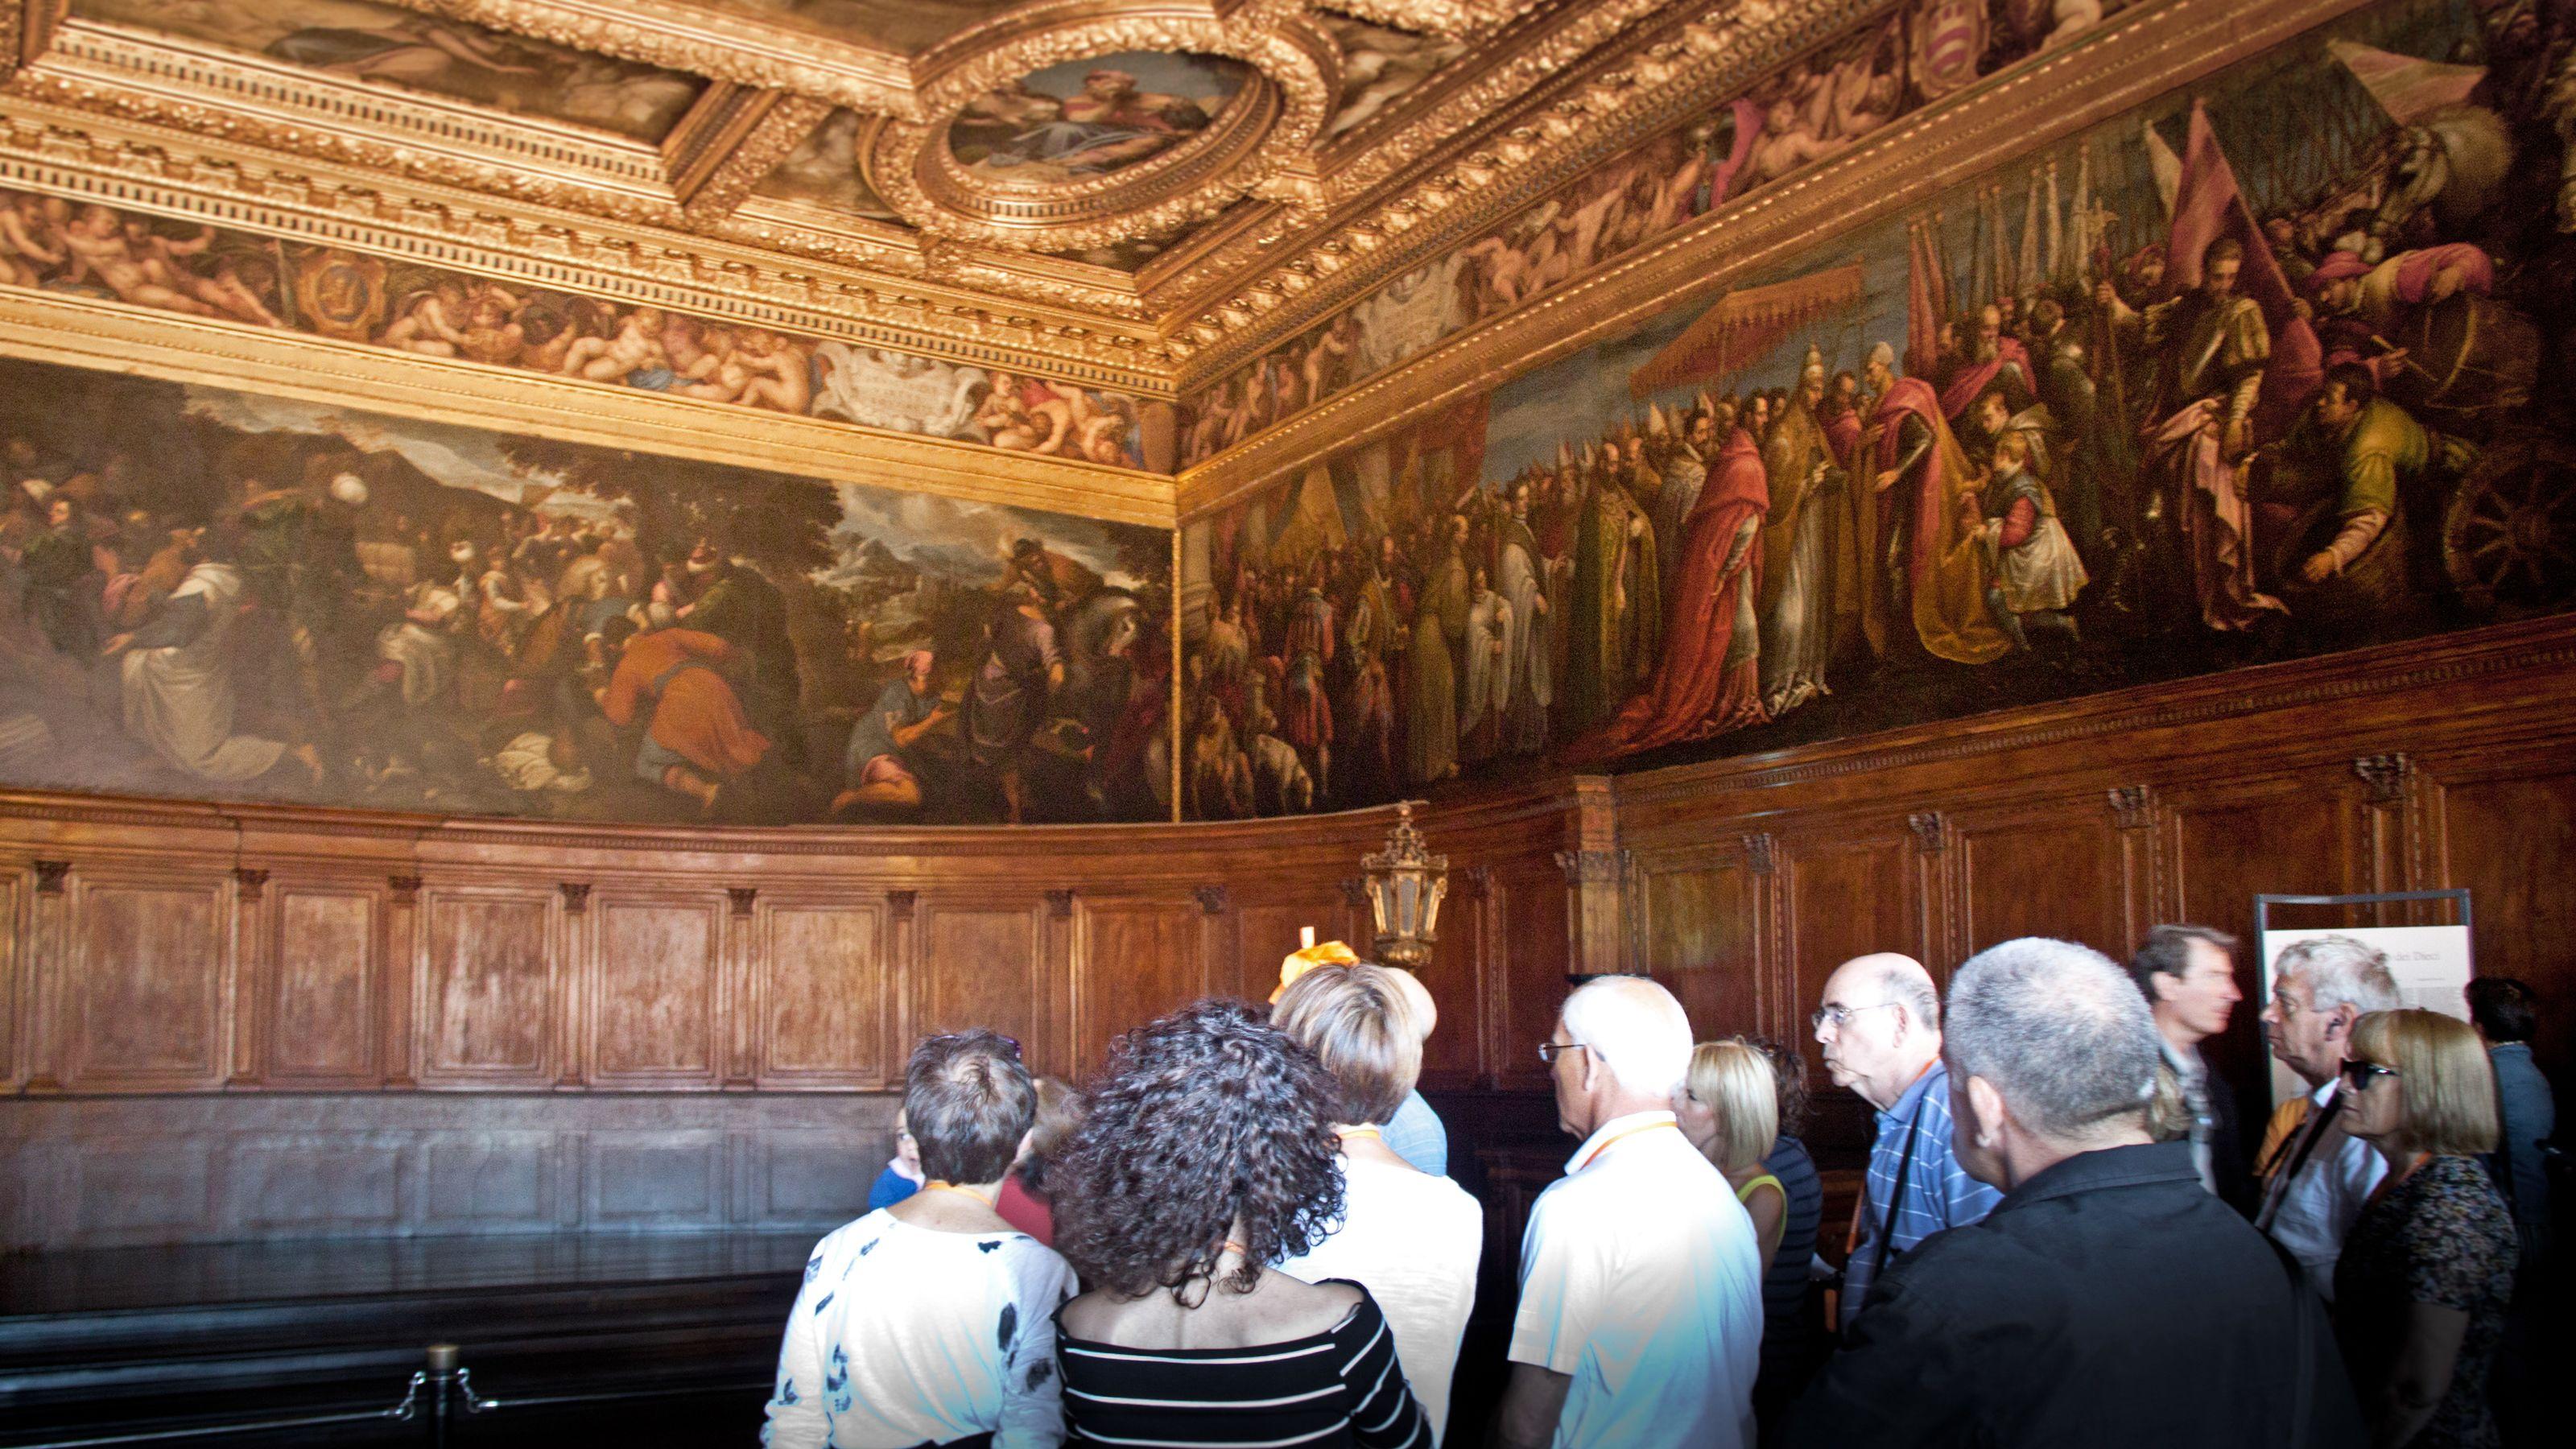 Interior art in Saint Mark's Basilica in Venice Italy